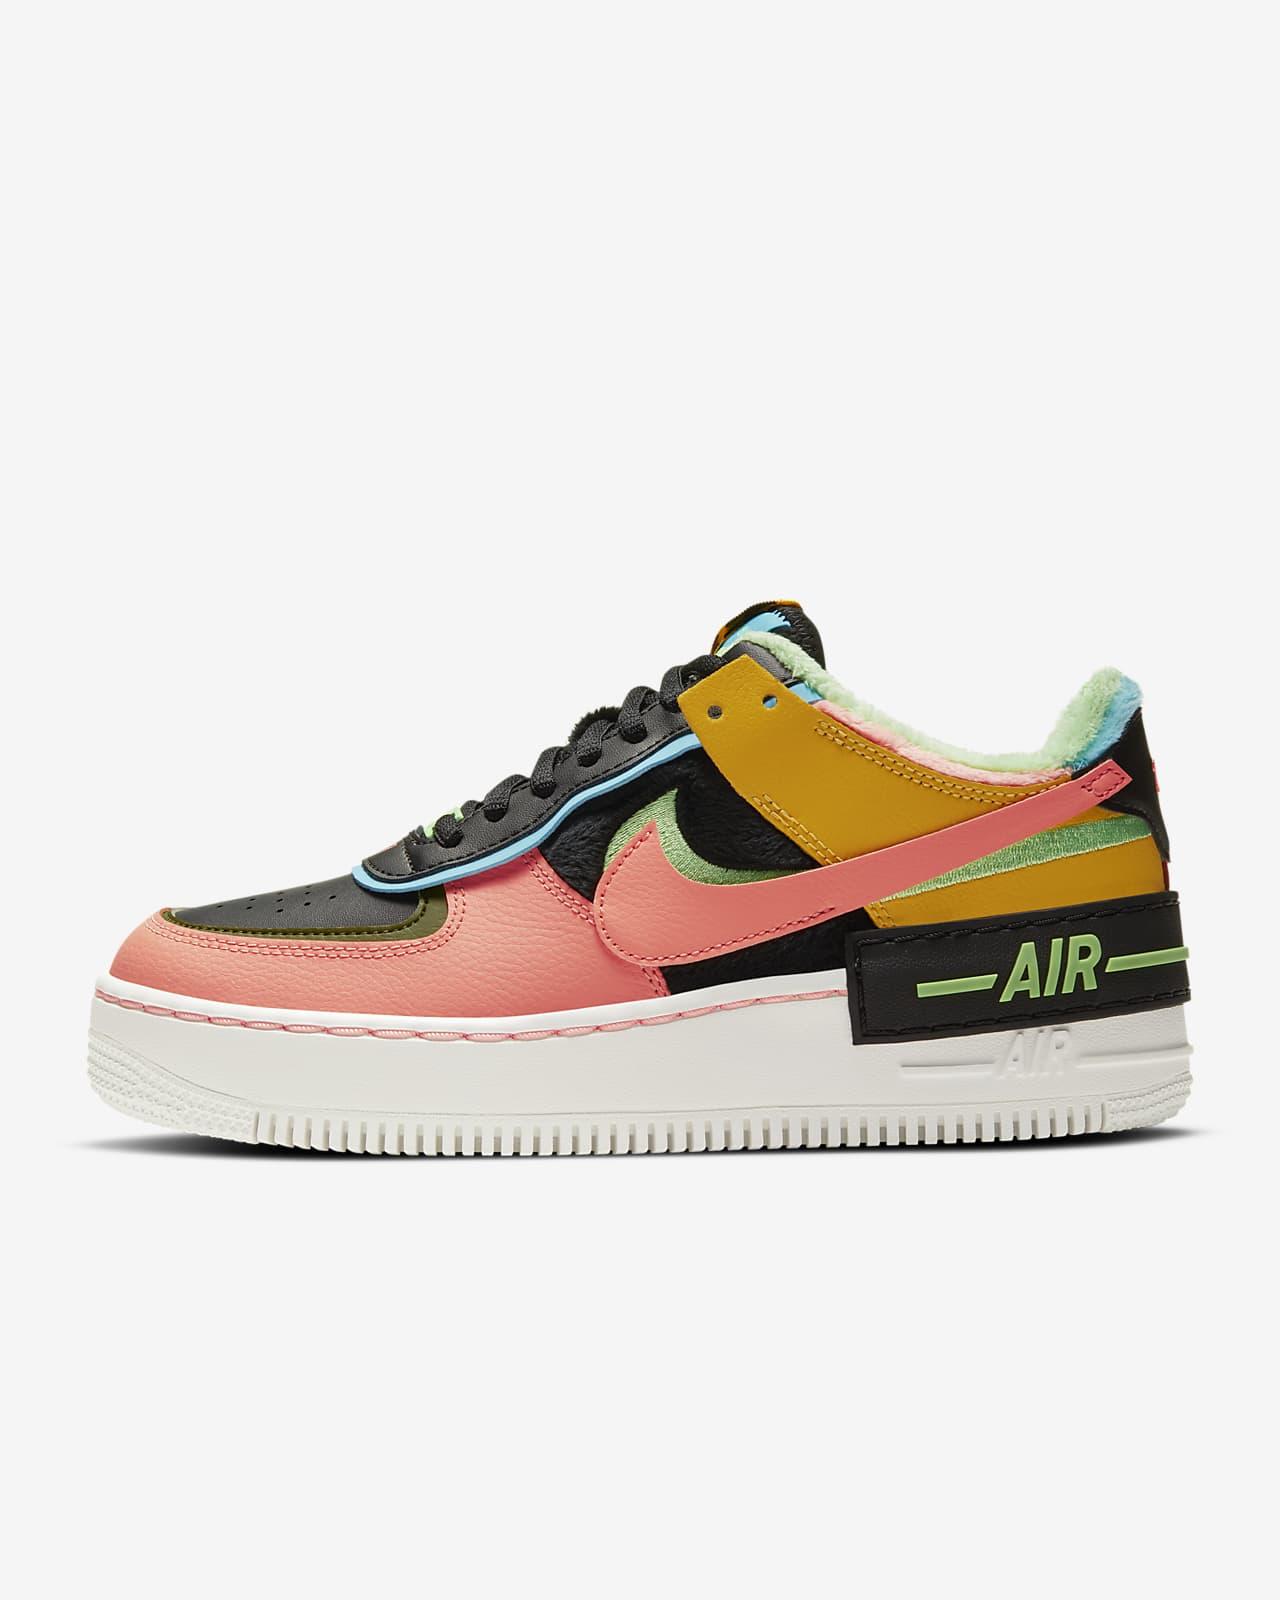 Nike Air Force 1 Shadow SE Women's Shoe